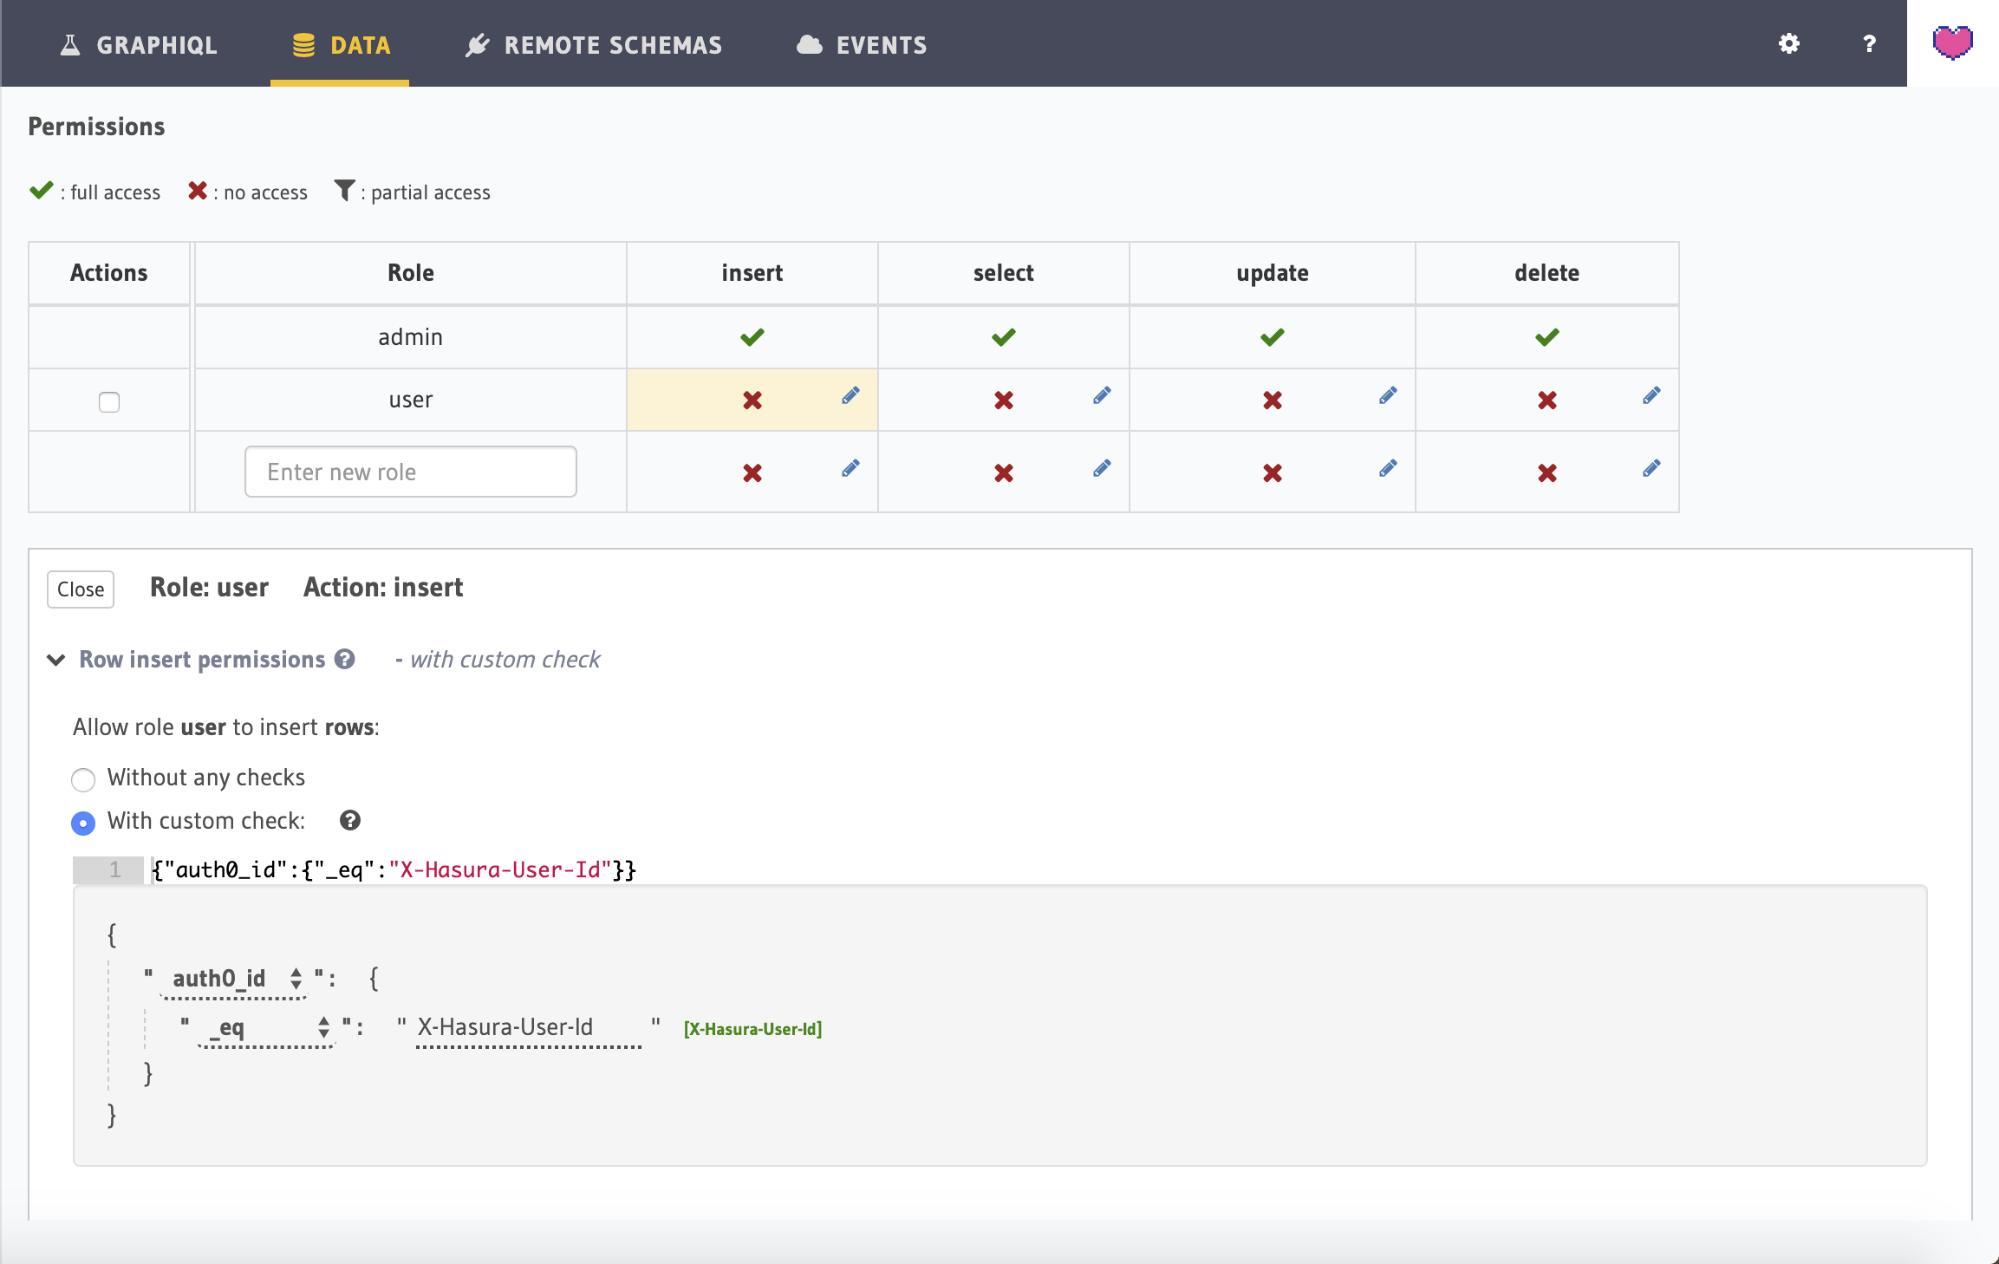 Screenshot showing the user permission checks